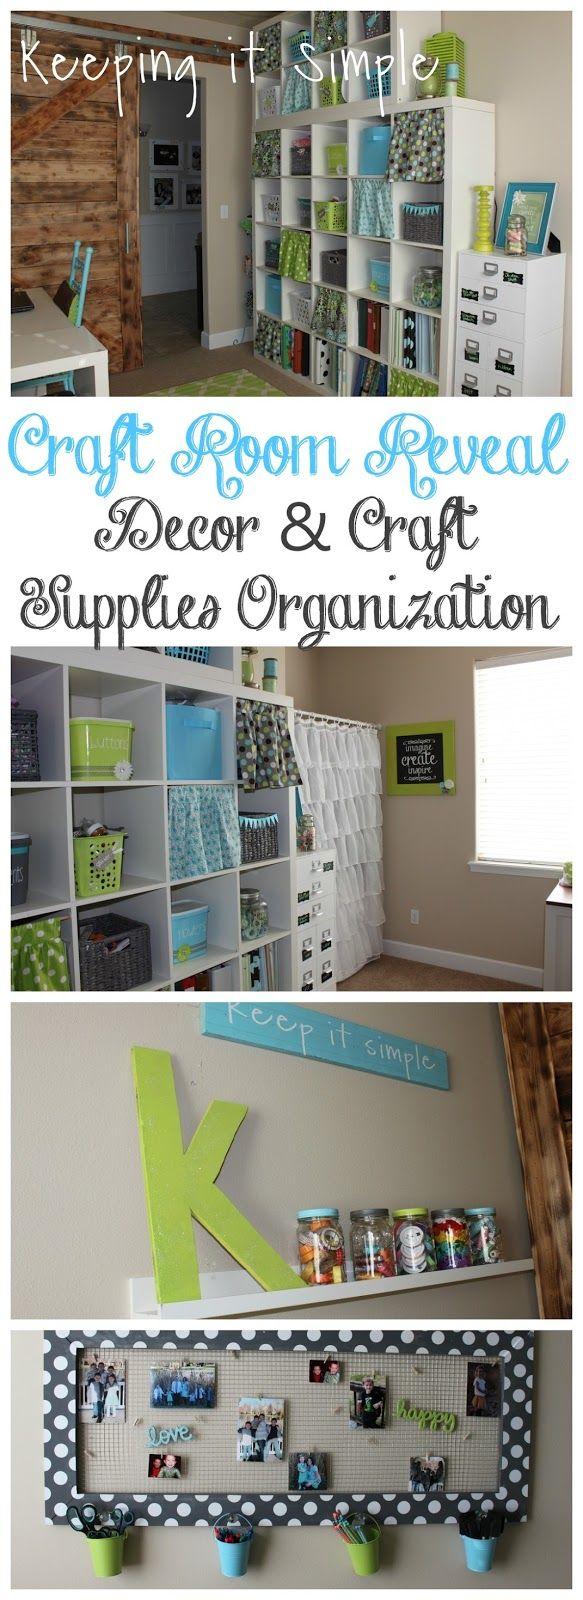 Craft supplies organization ideas - Craft Room Decor Ideas And Craft Supplies Organization